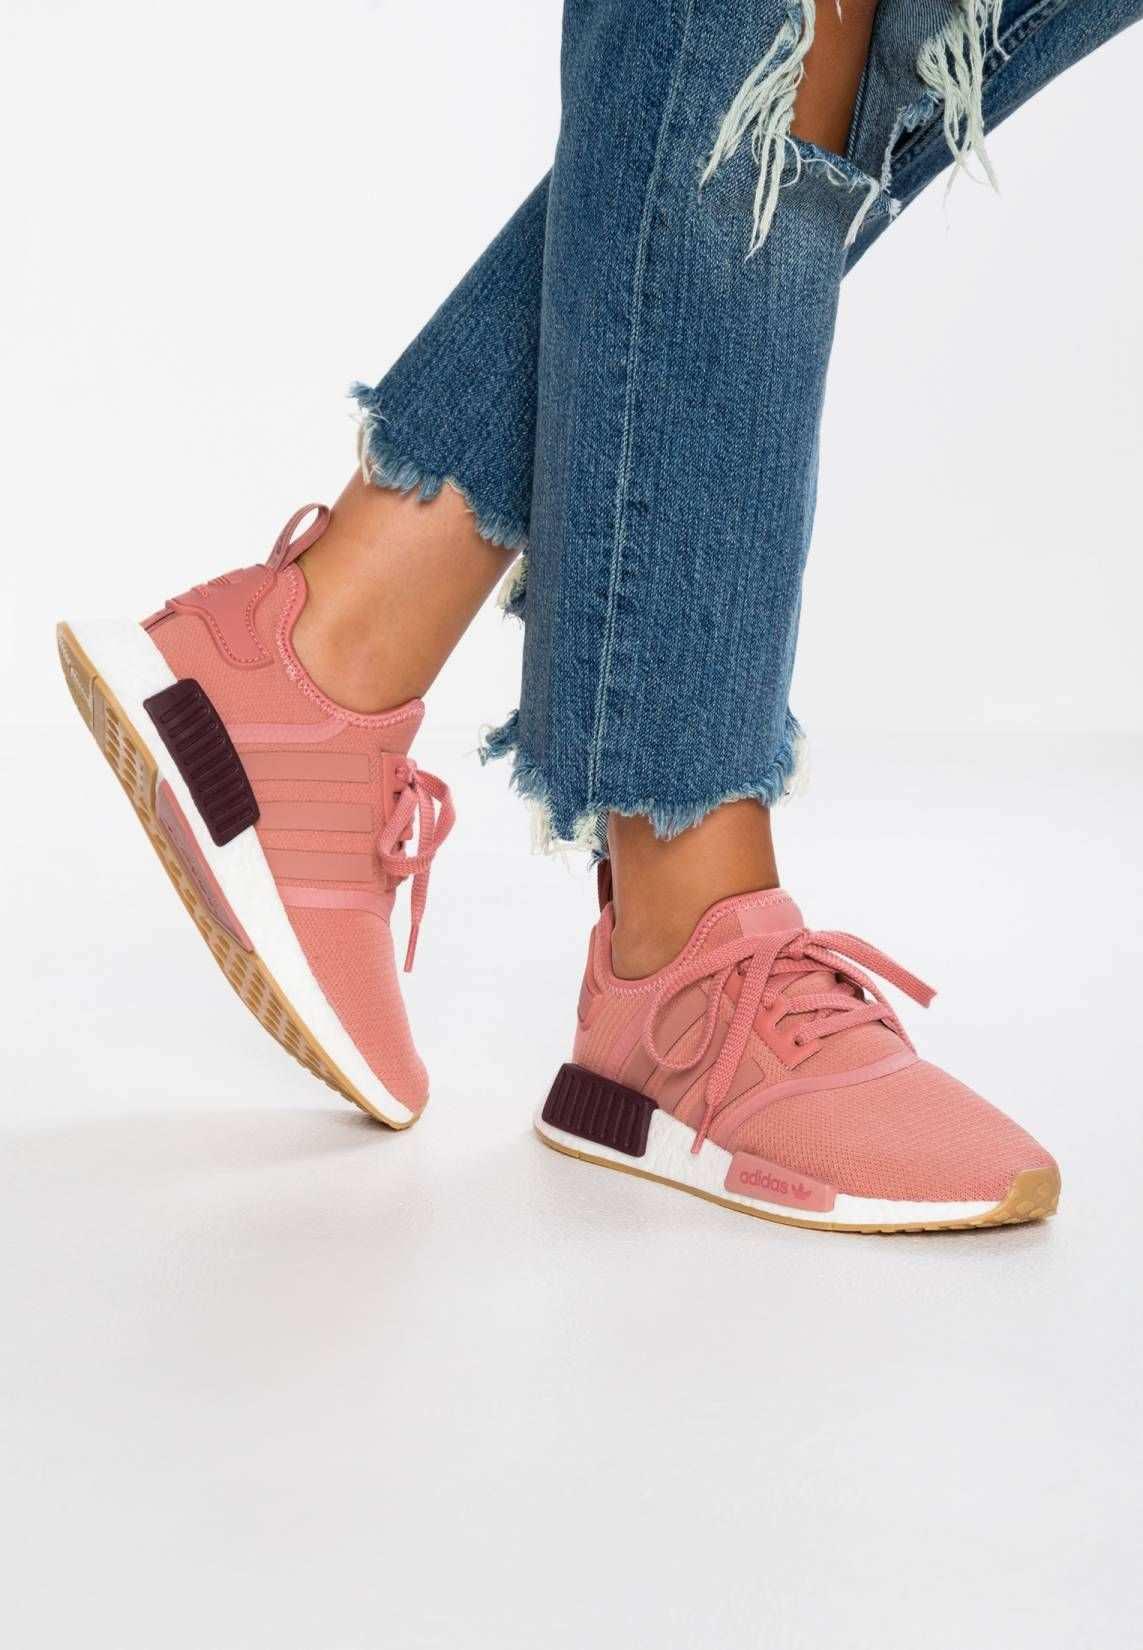 Adidas Originals Nmd R1 Sneaker Low Raw Pink Footwear White Sohle Kunststoff Decksohle Textil Innenmaterial Textil Oberma Schuhe Damen Zalando Sneaker